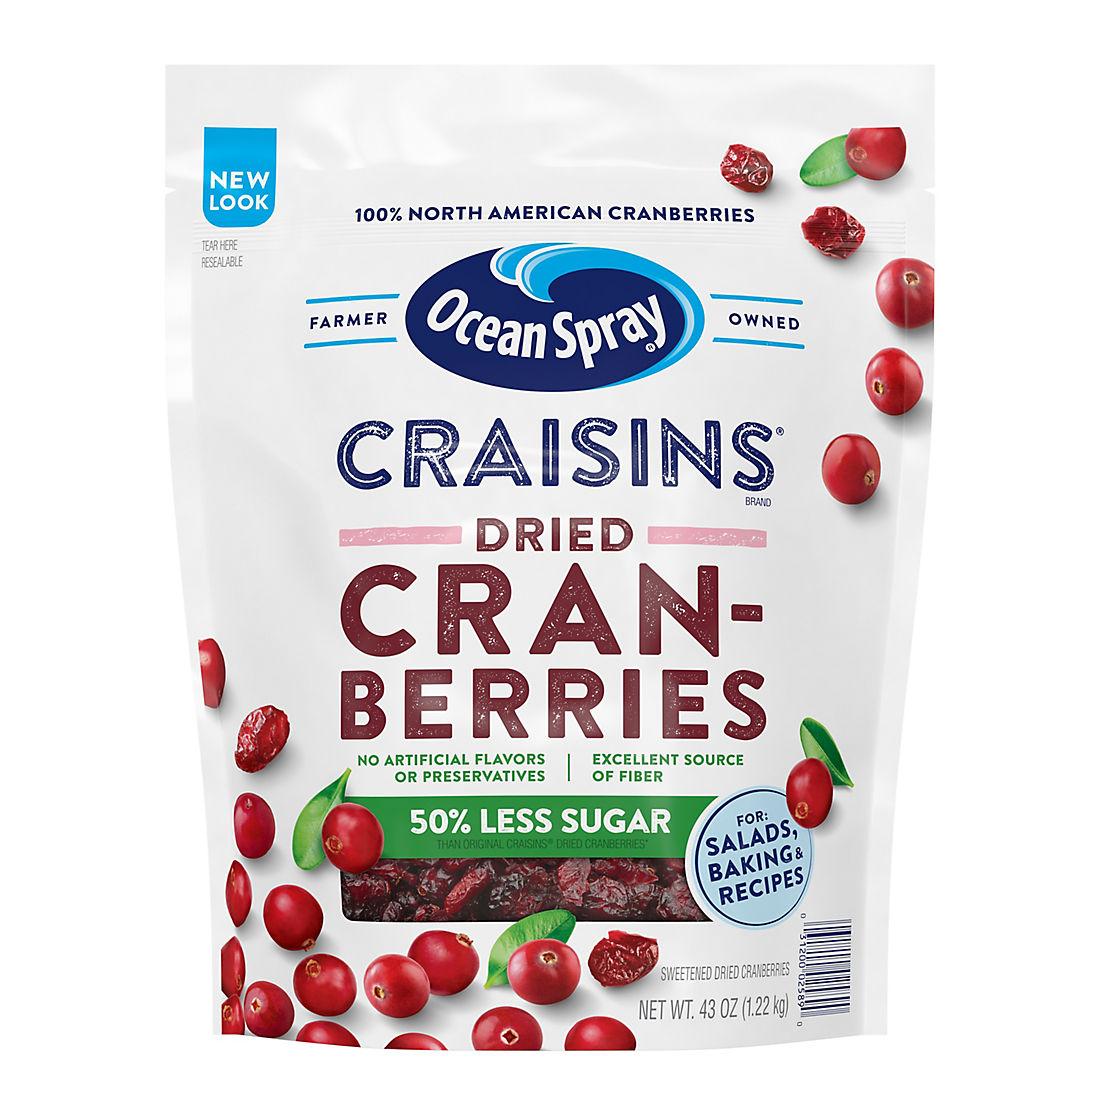 Reduced Sugar Craisins, 43 oz